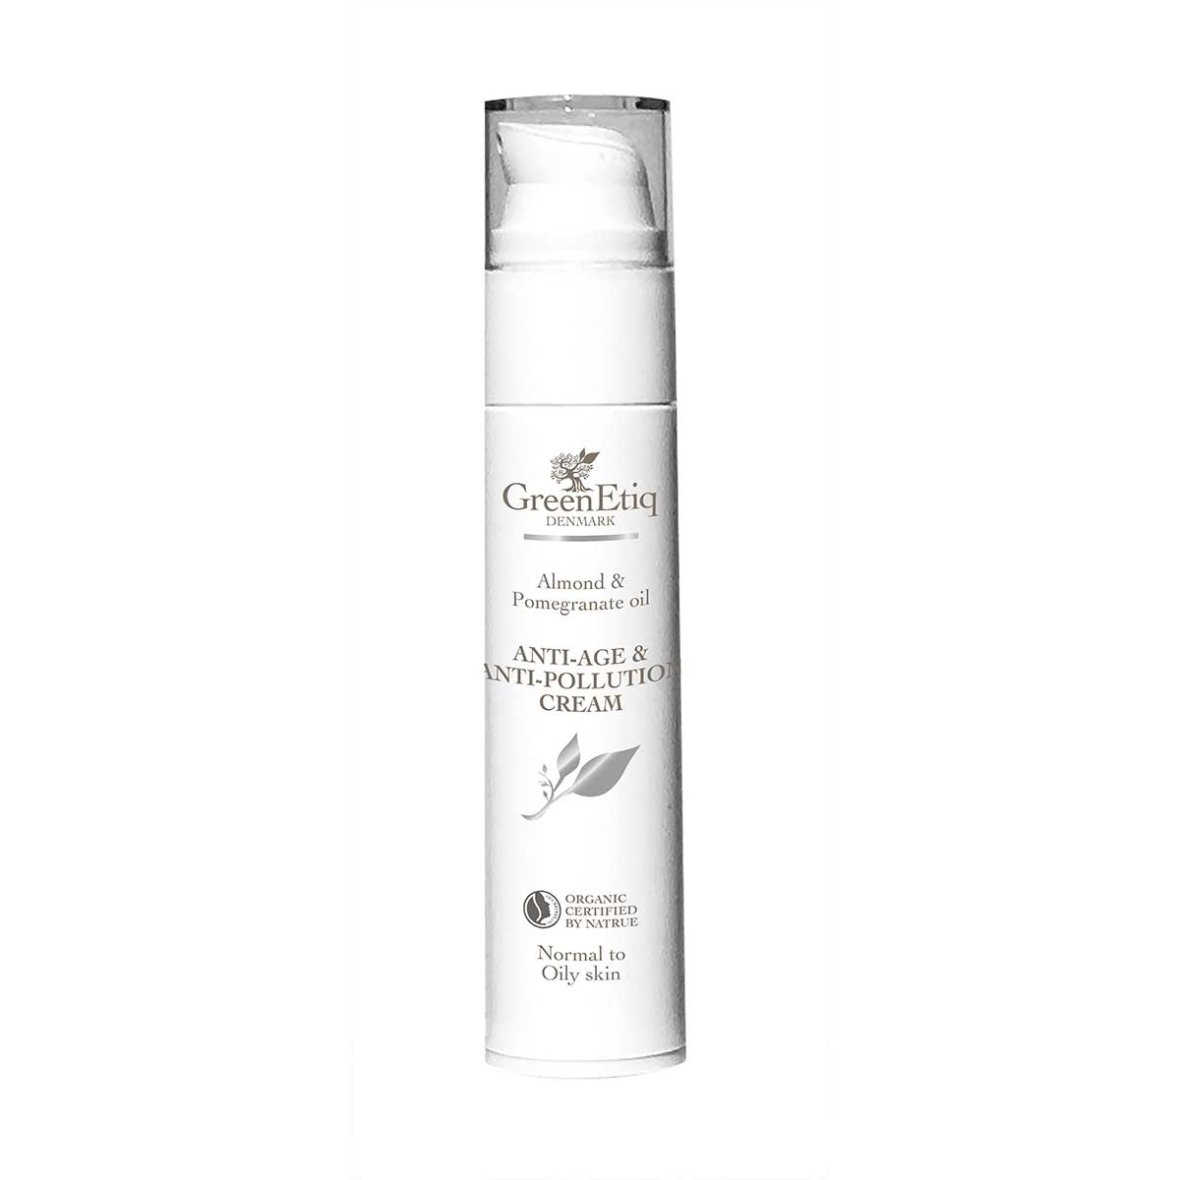 green etiq antiage anti pollution cream